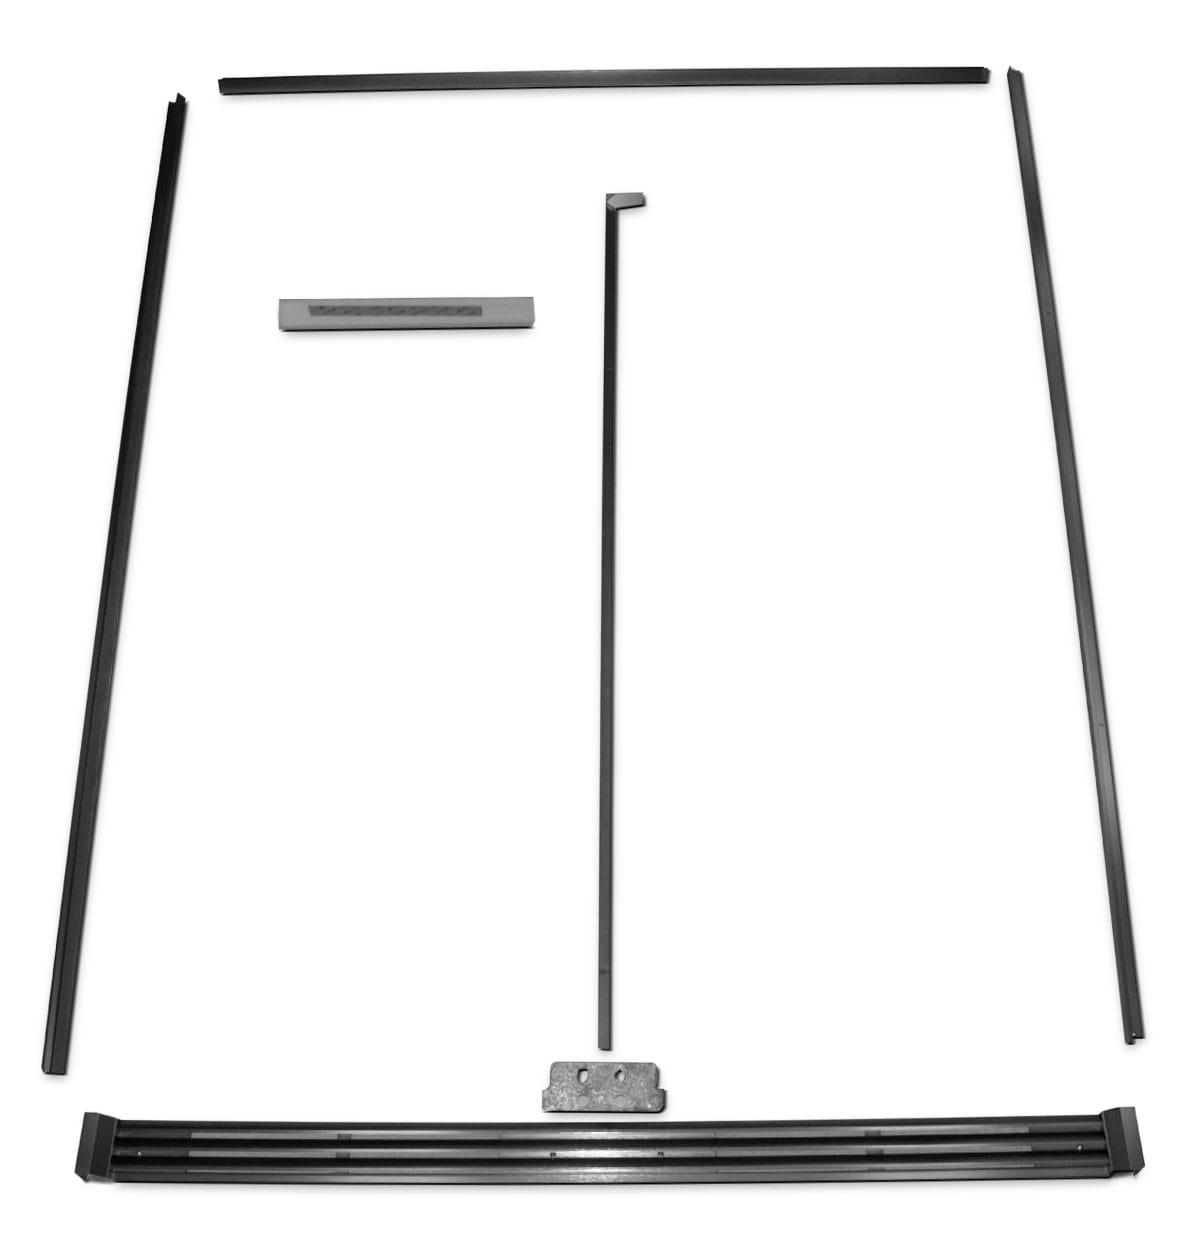 Appliance Accessories - Whirlpool SideKick® Upright Freezer/Refrigerator Trim Kit – SKT60M